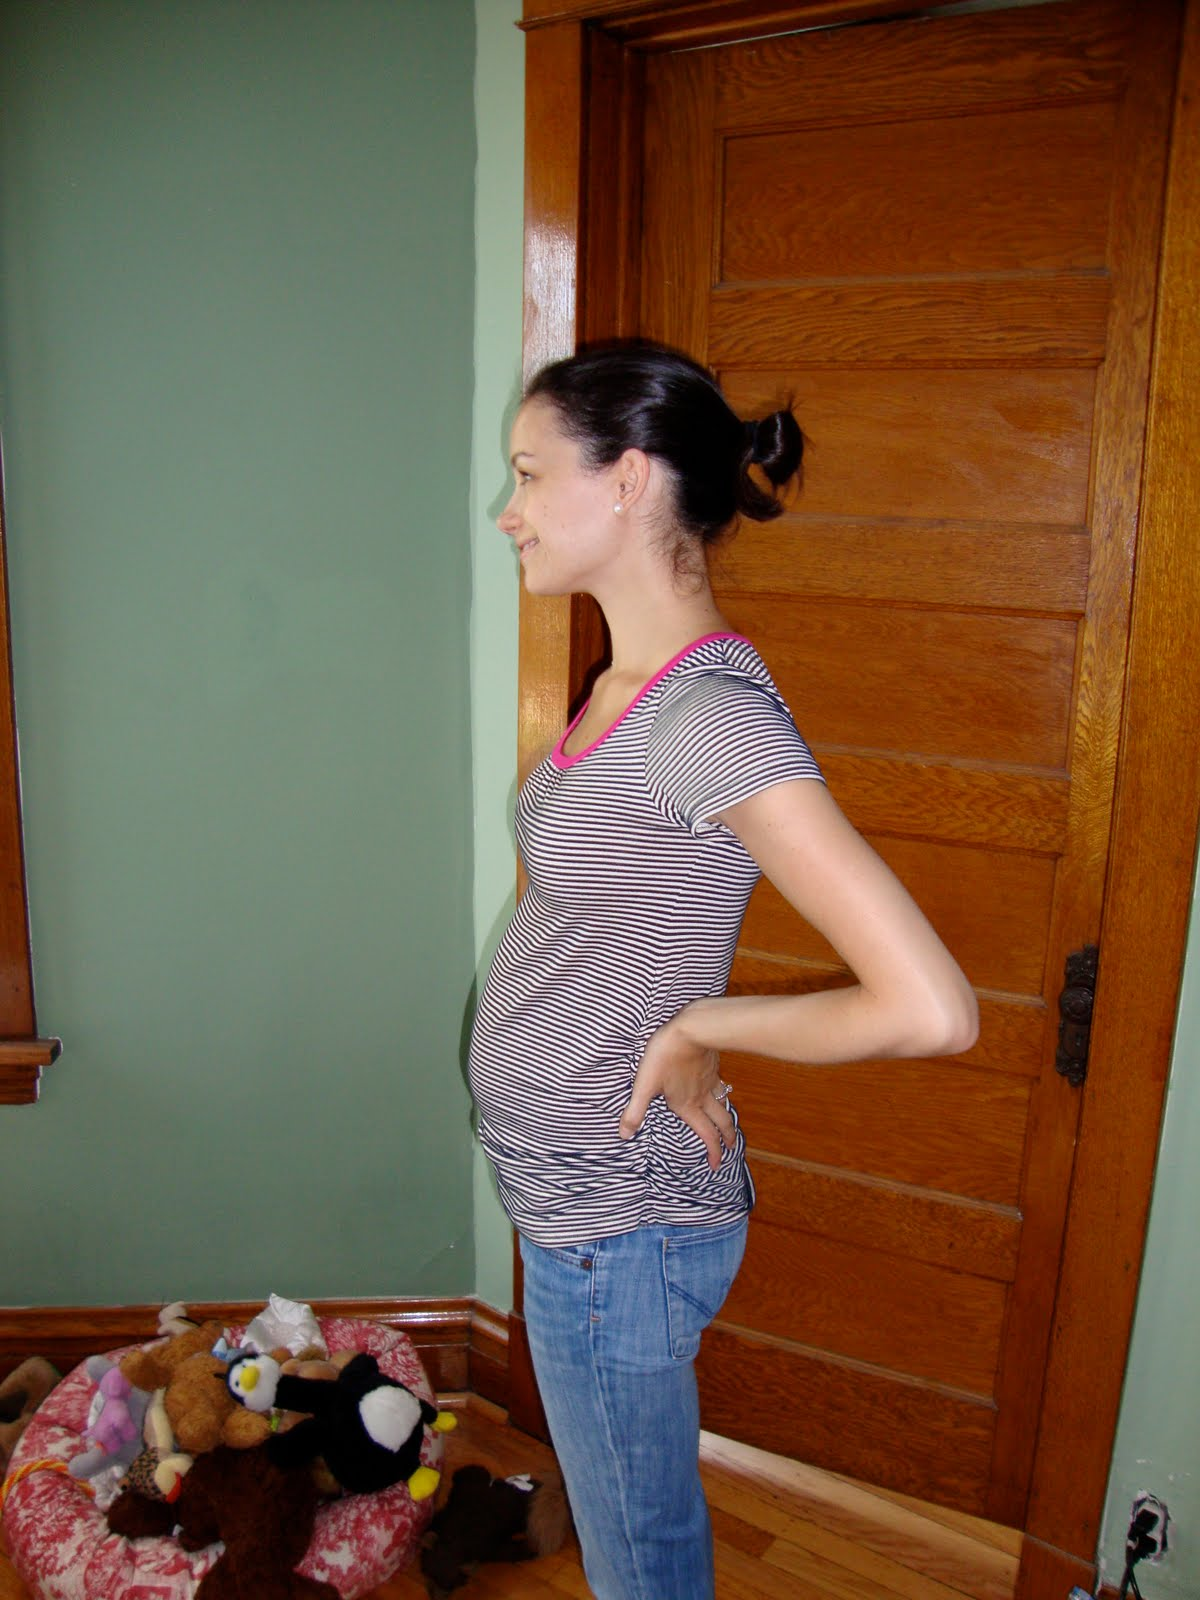 wiggle room: anatomy of a bump